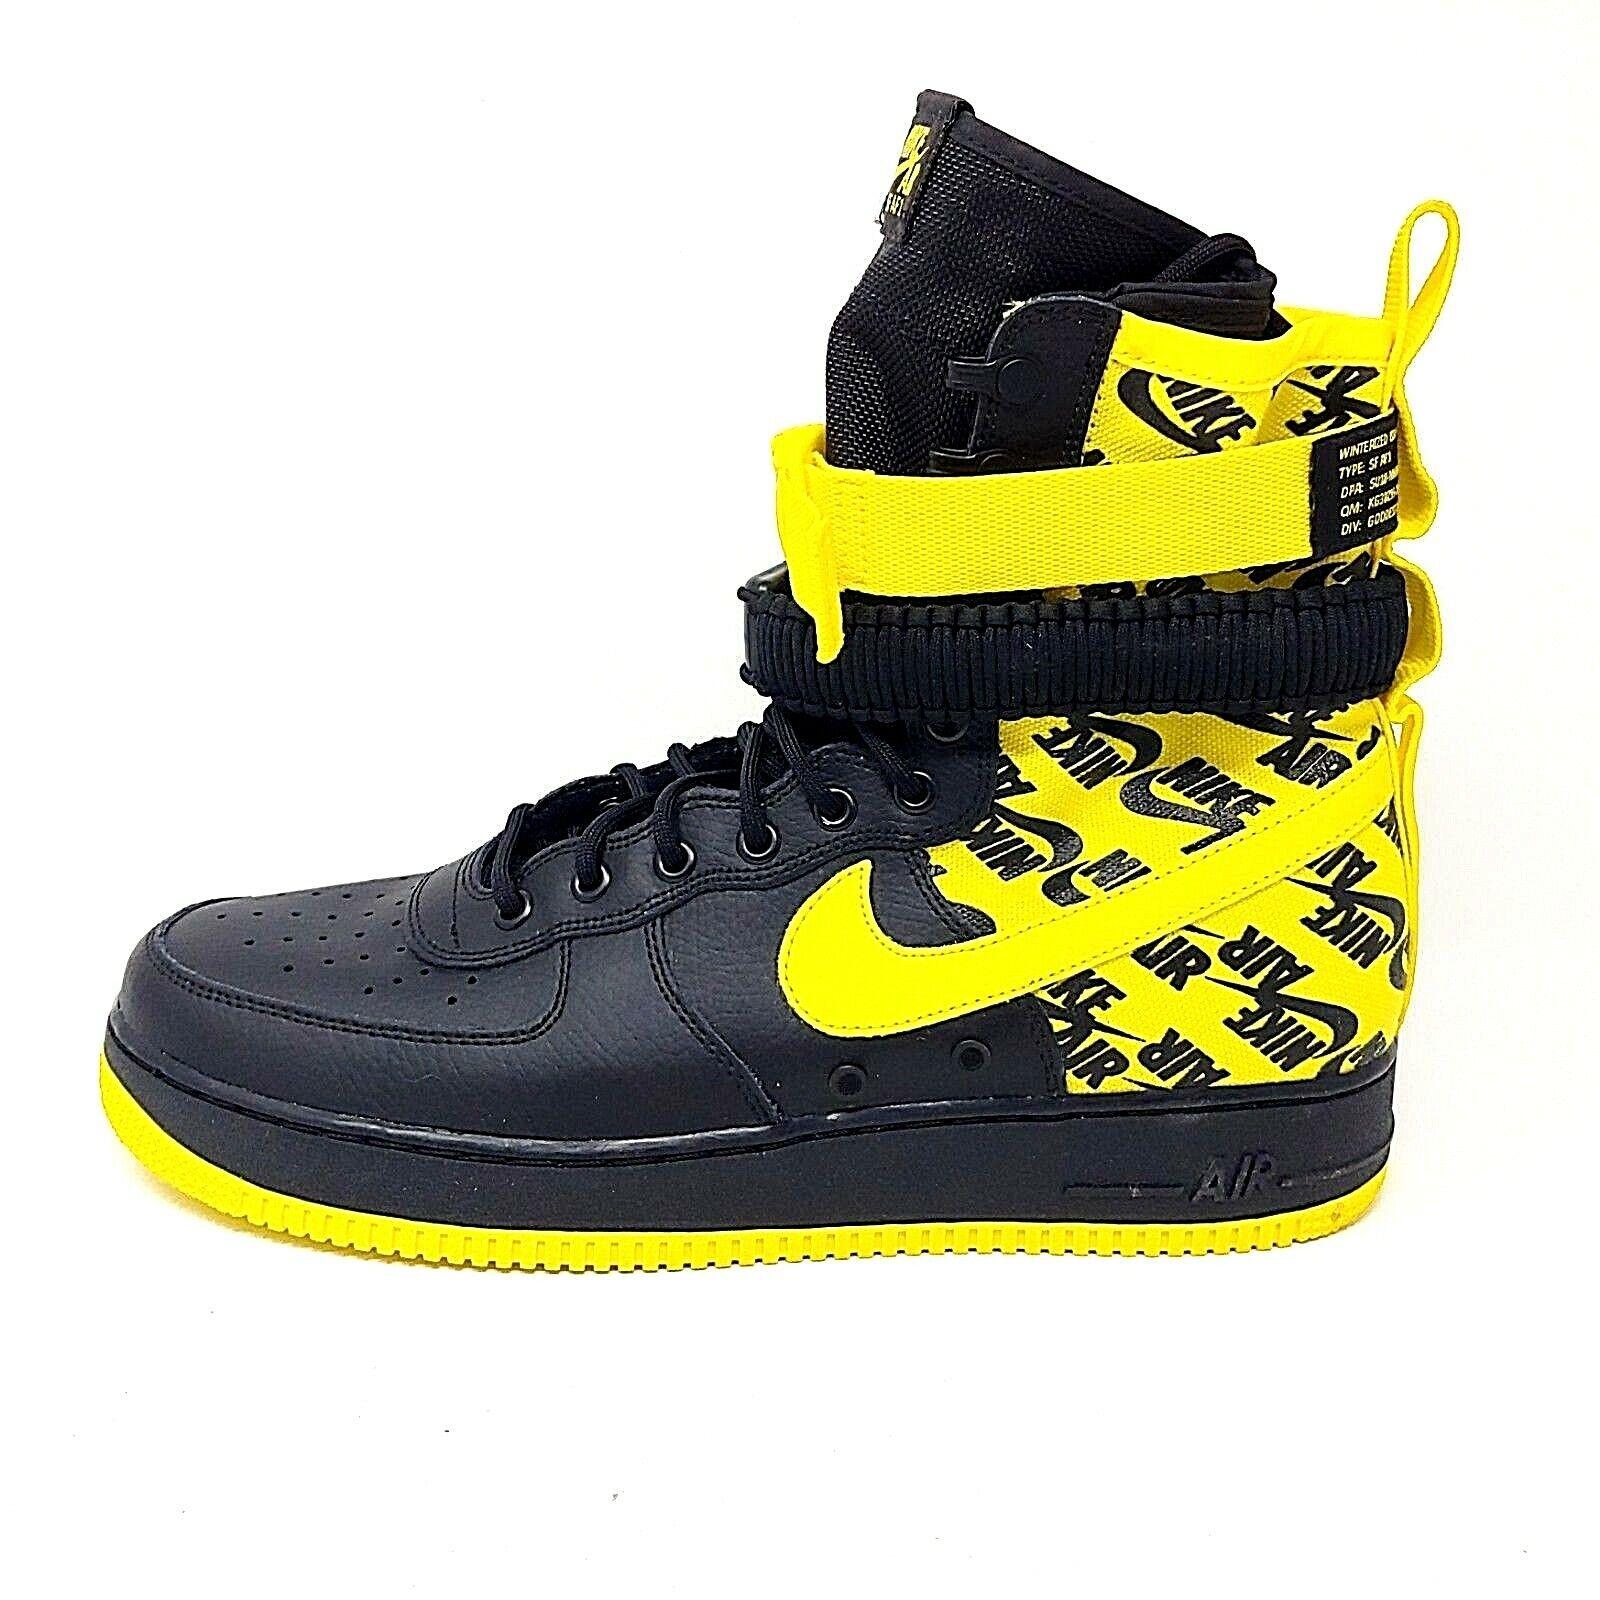 f22f76c9235fc Nike SF Air Force 1 High '17 AF1 Black Dynamic Dynamic Dynamic Yellow  Sneakers Mens Size 12 cd9822